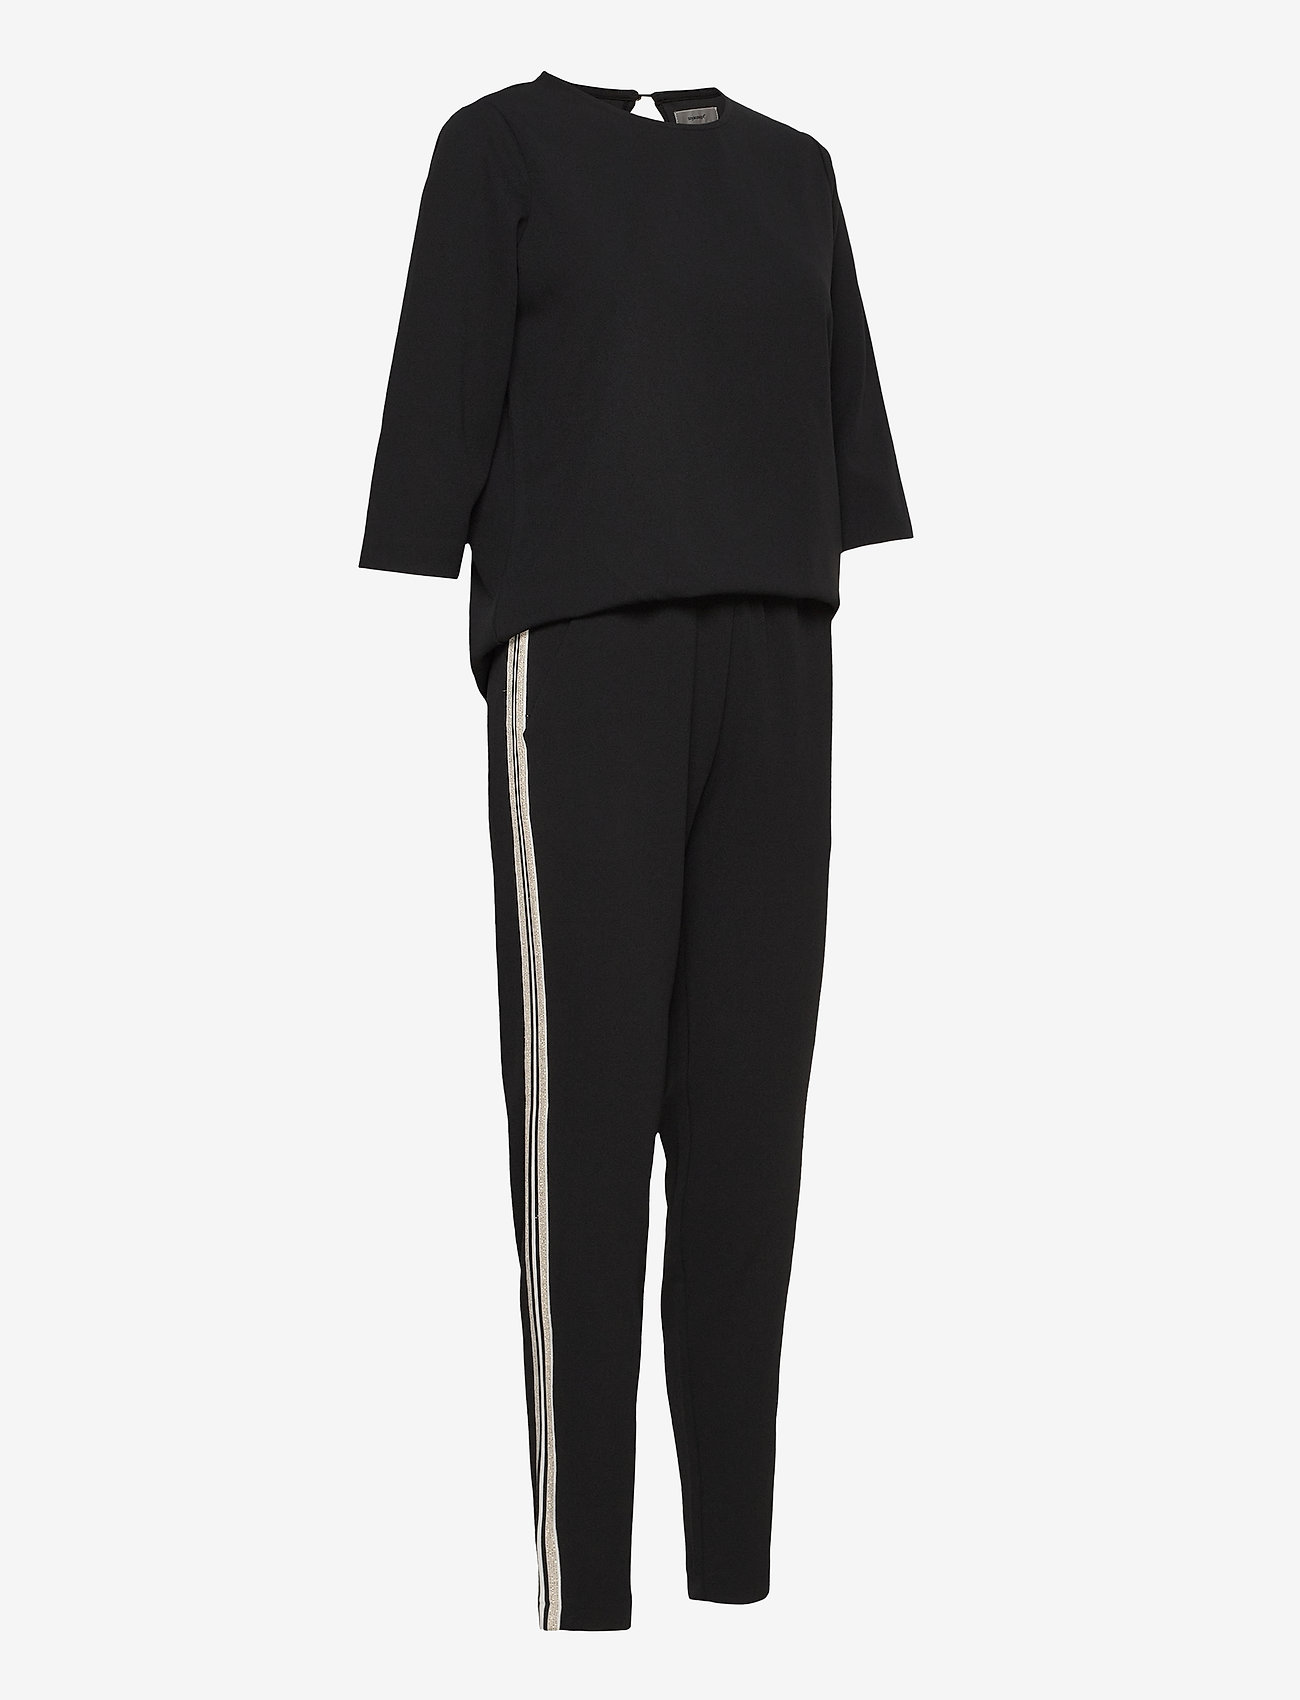 Soyaconcept - SC-MASCHA - clothing - black - 2